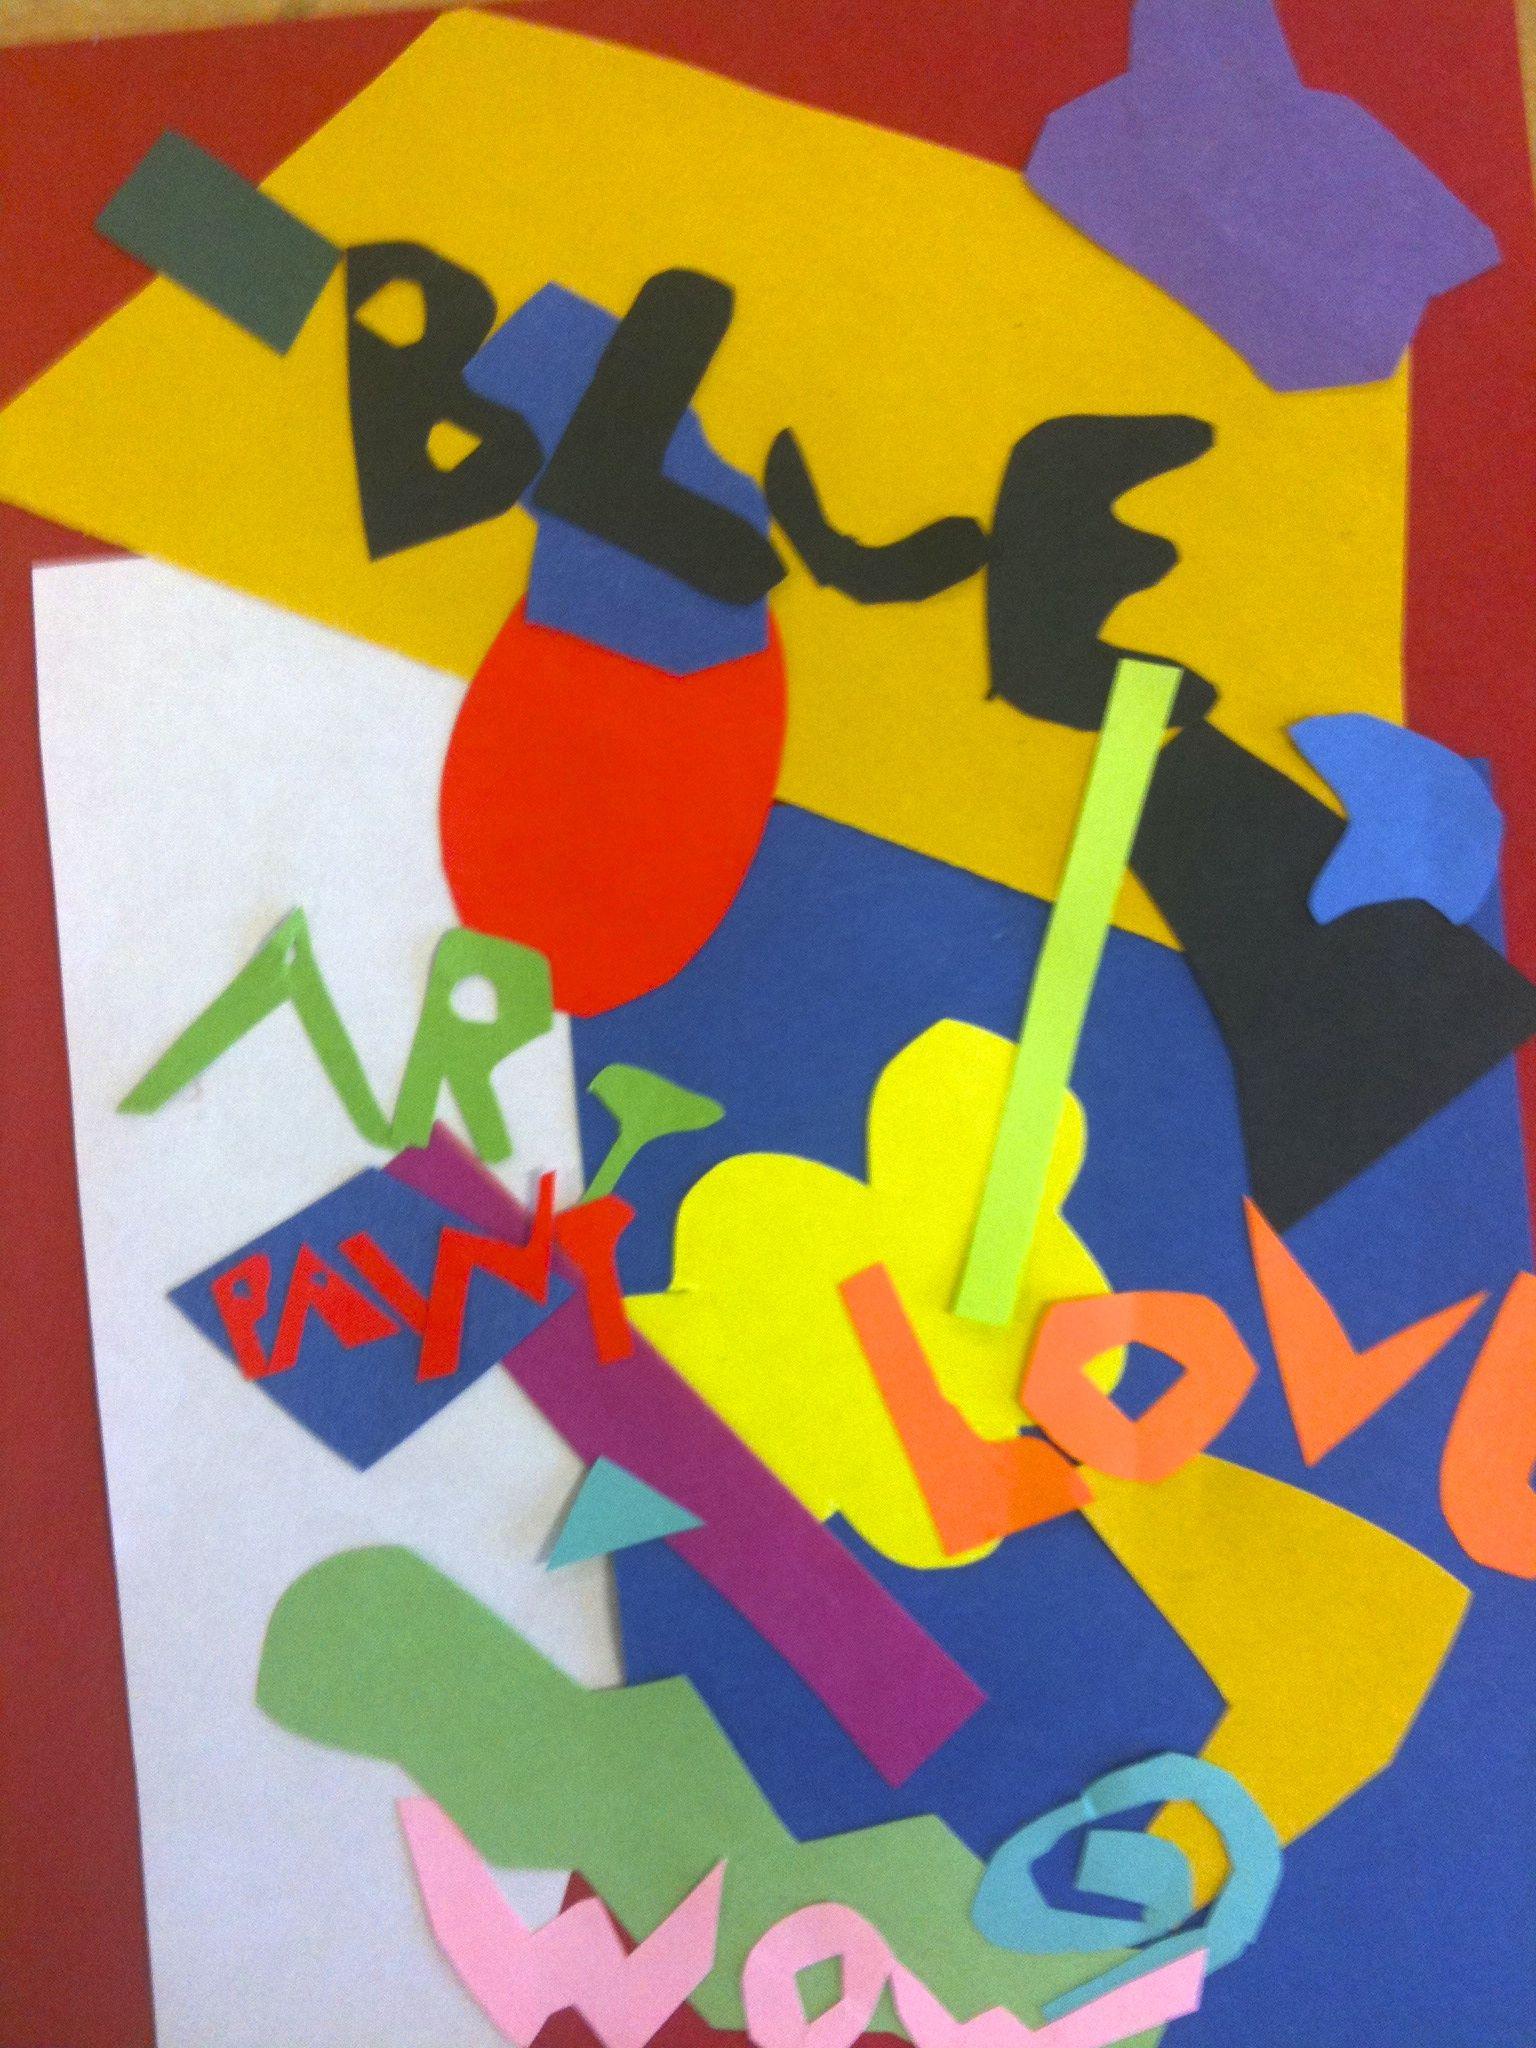 Stuart Davis Lesson On Shape Color Overlapping Pop Art Shapes With Construction Paper